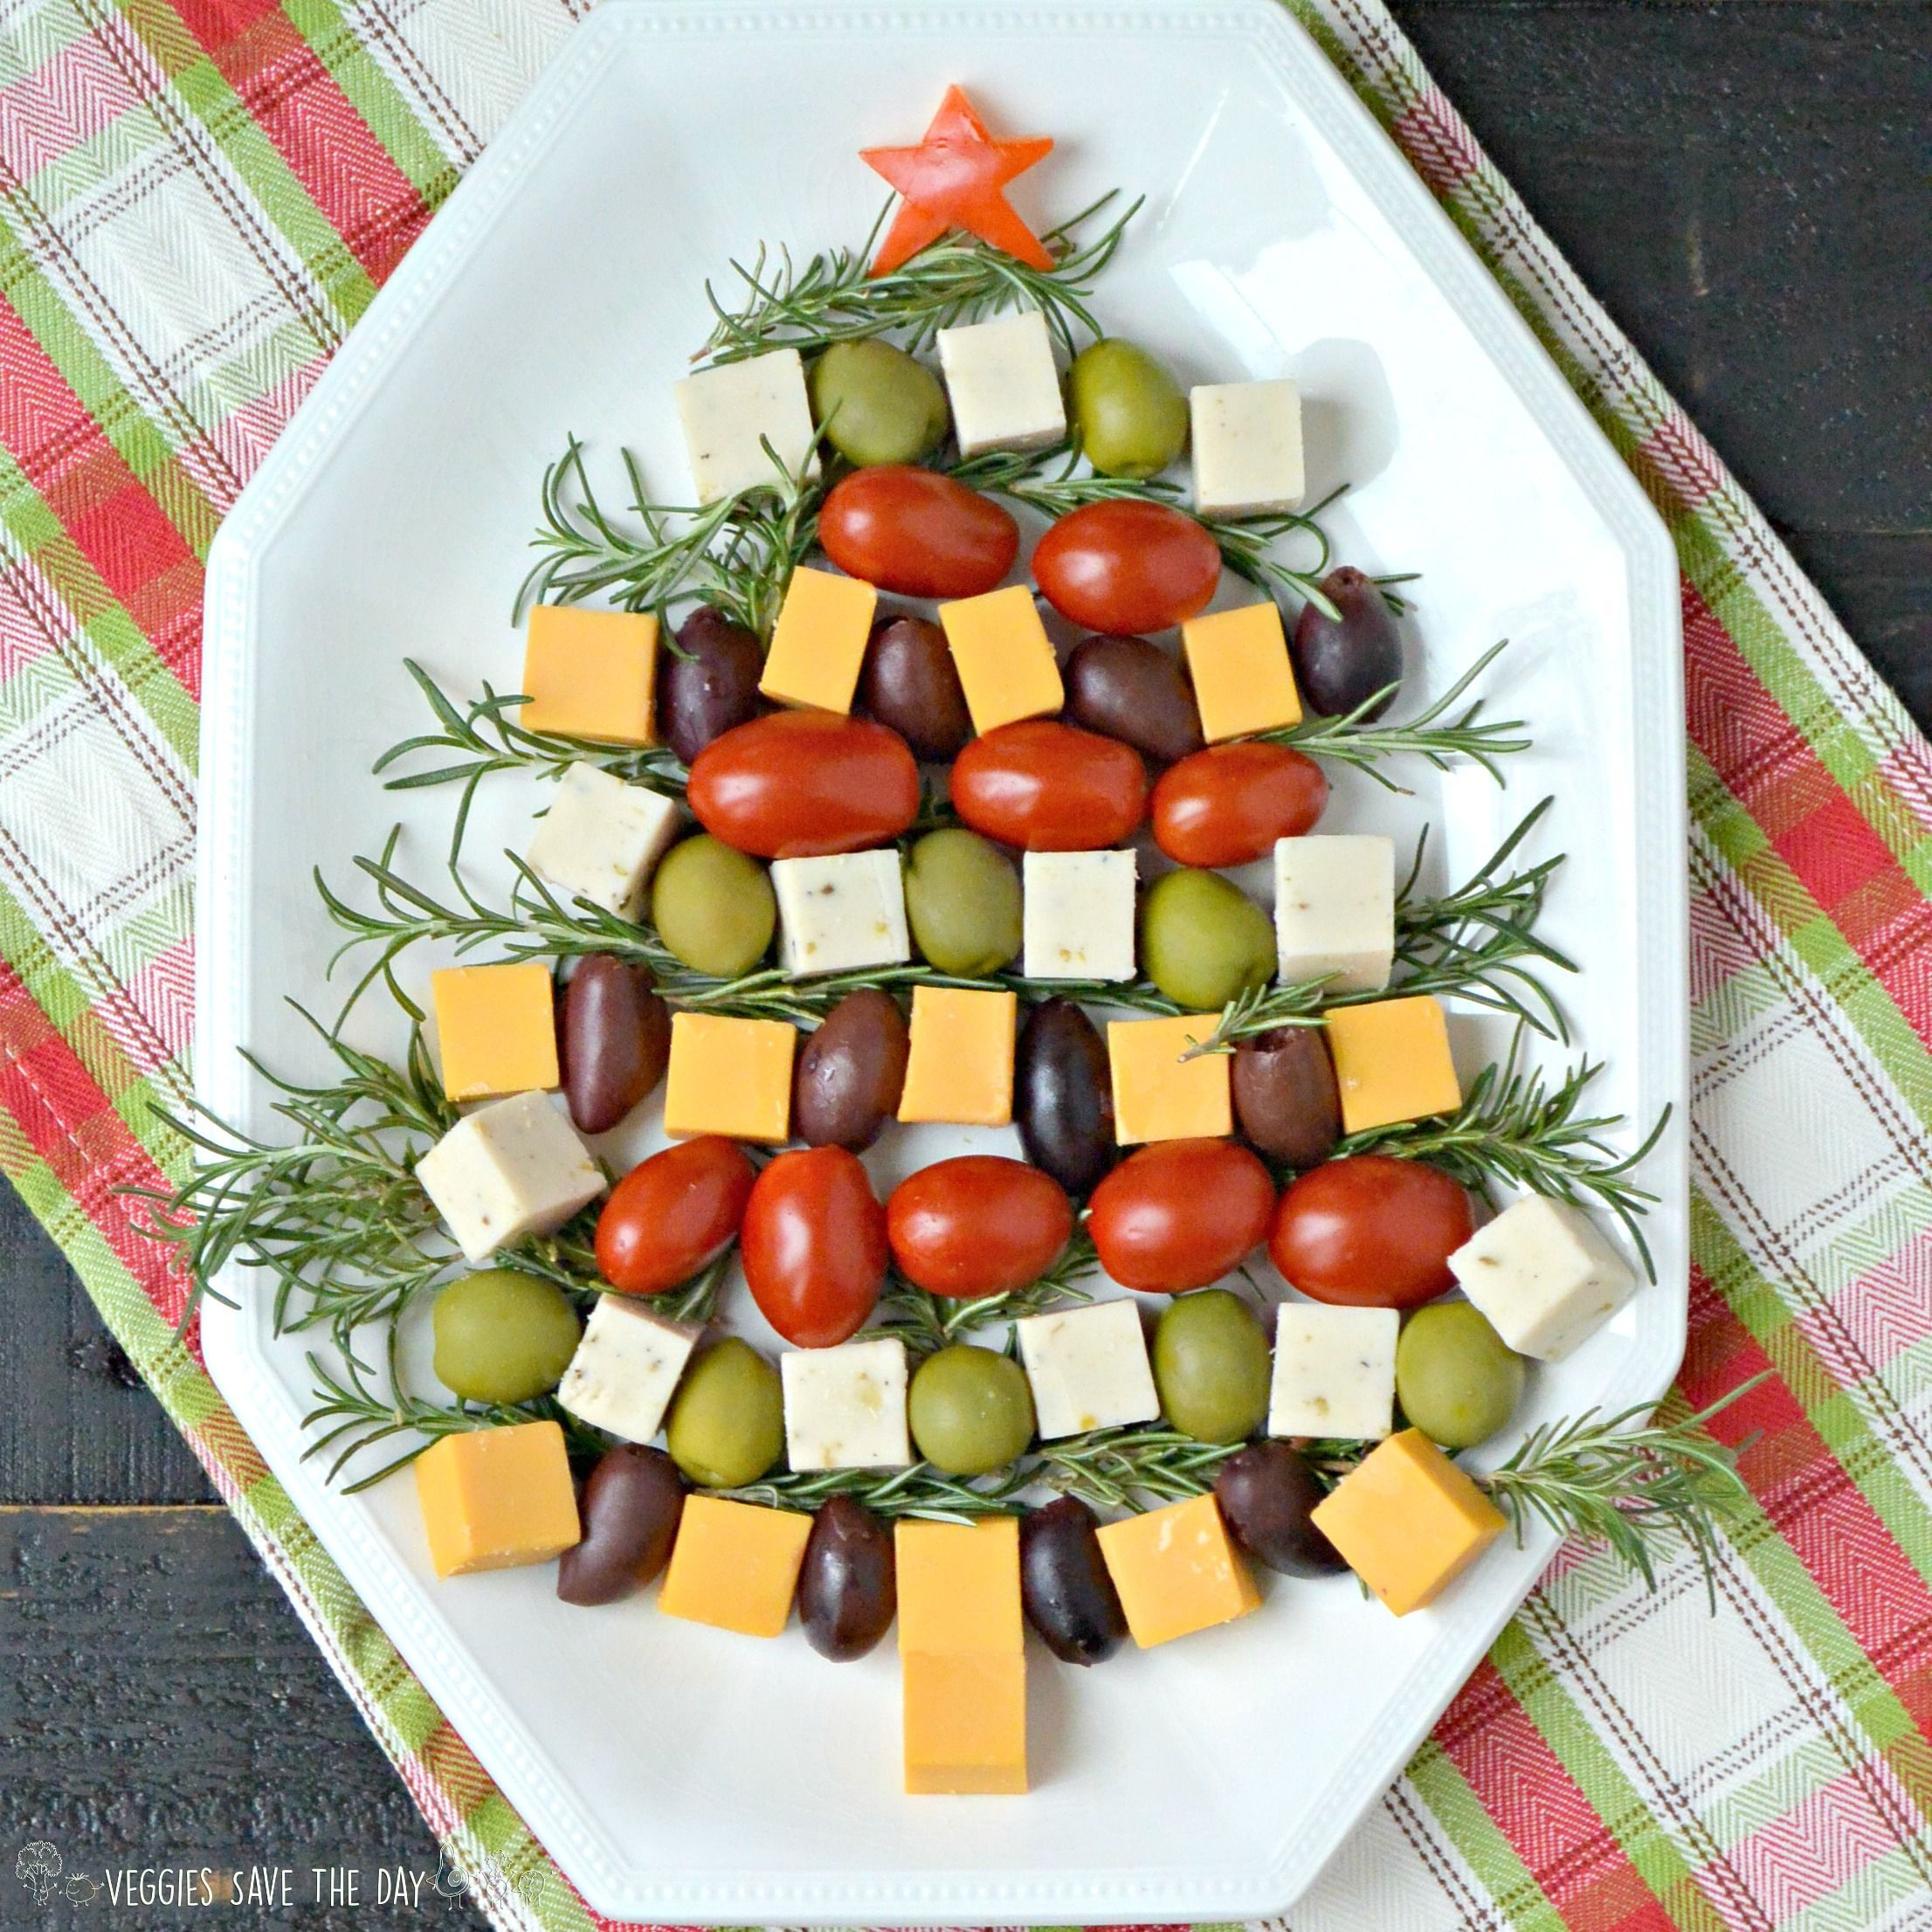 Easy Recipes for Holiday Entertaining Vegan christmas